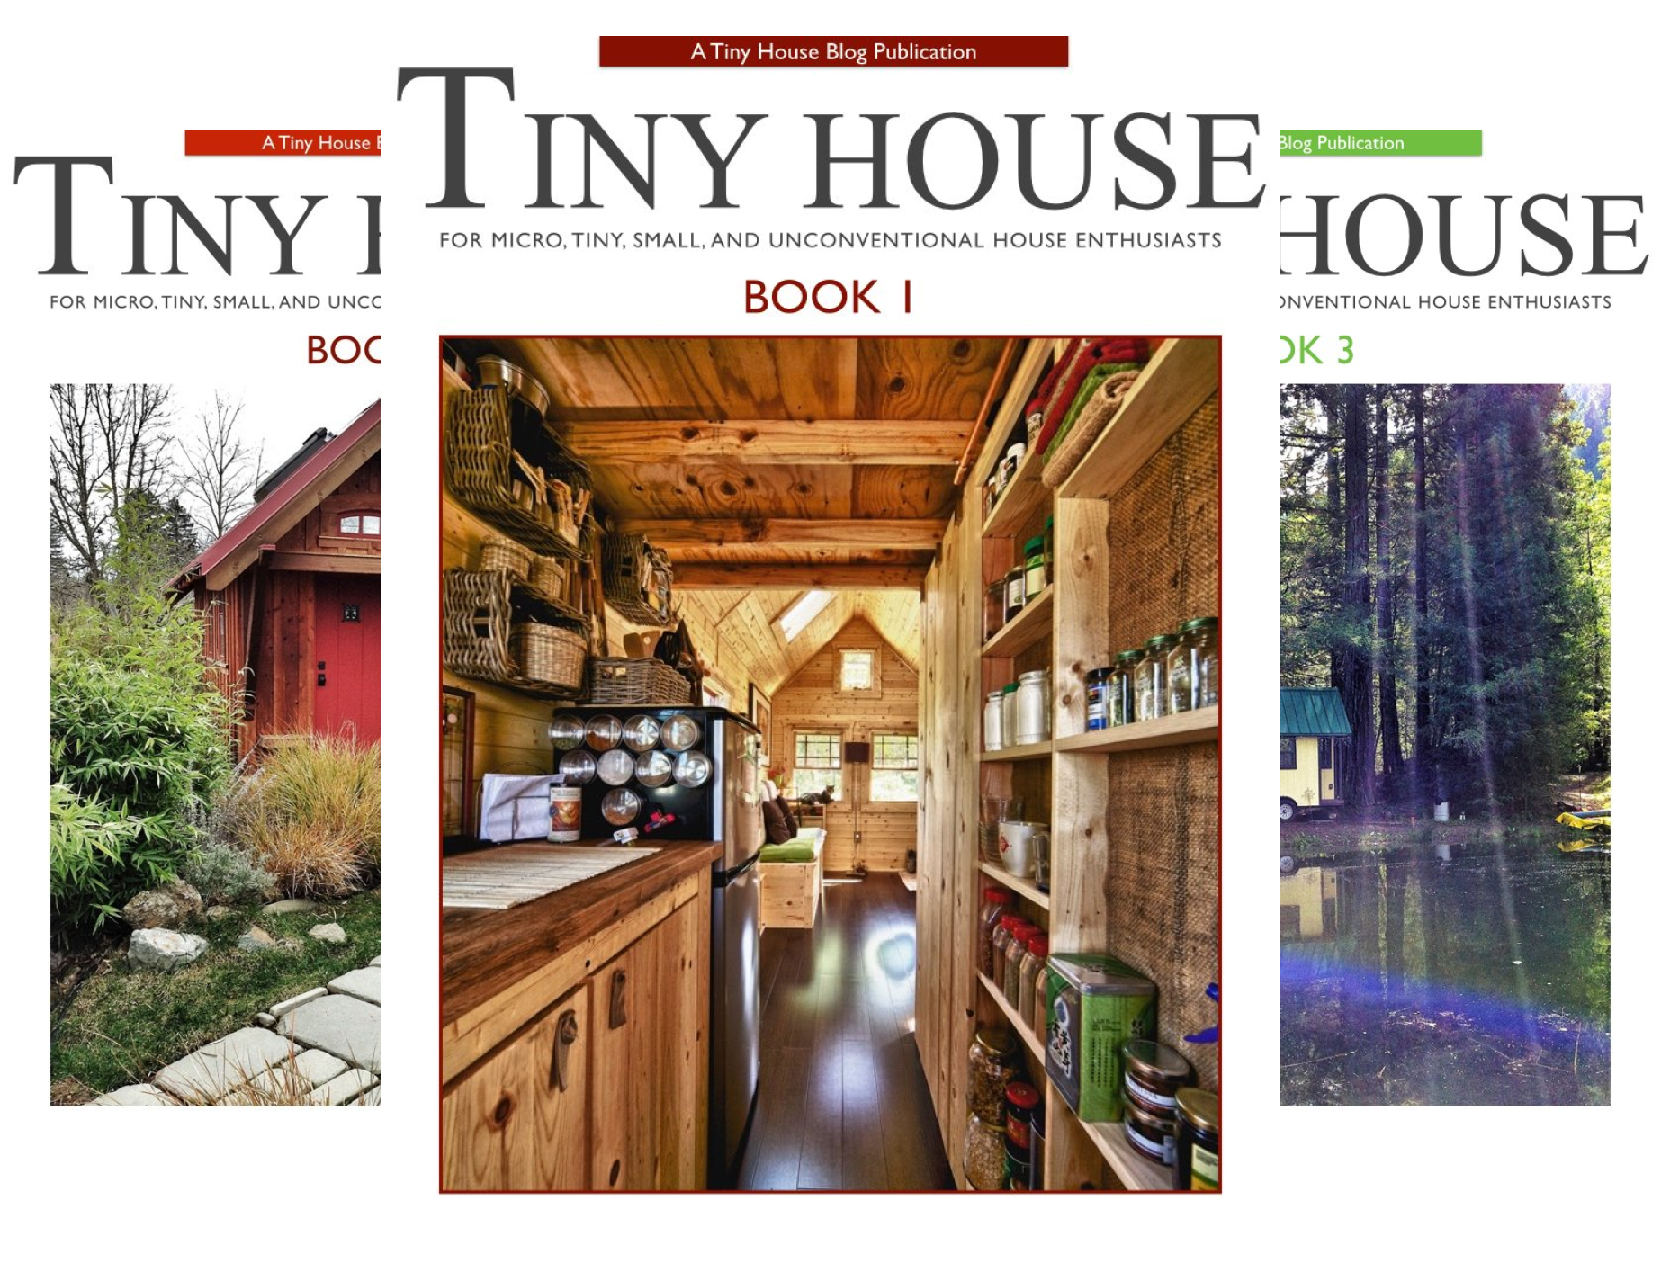 Tiny House (6 Book Series)